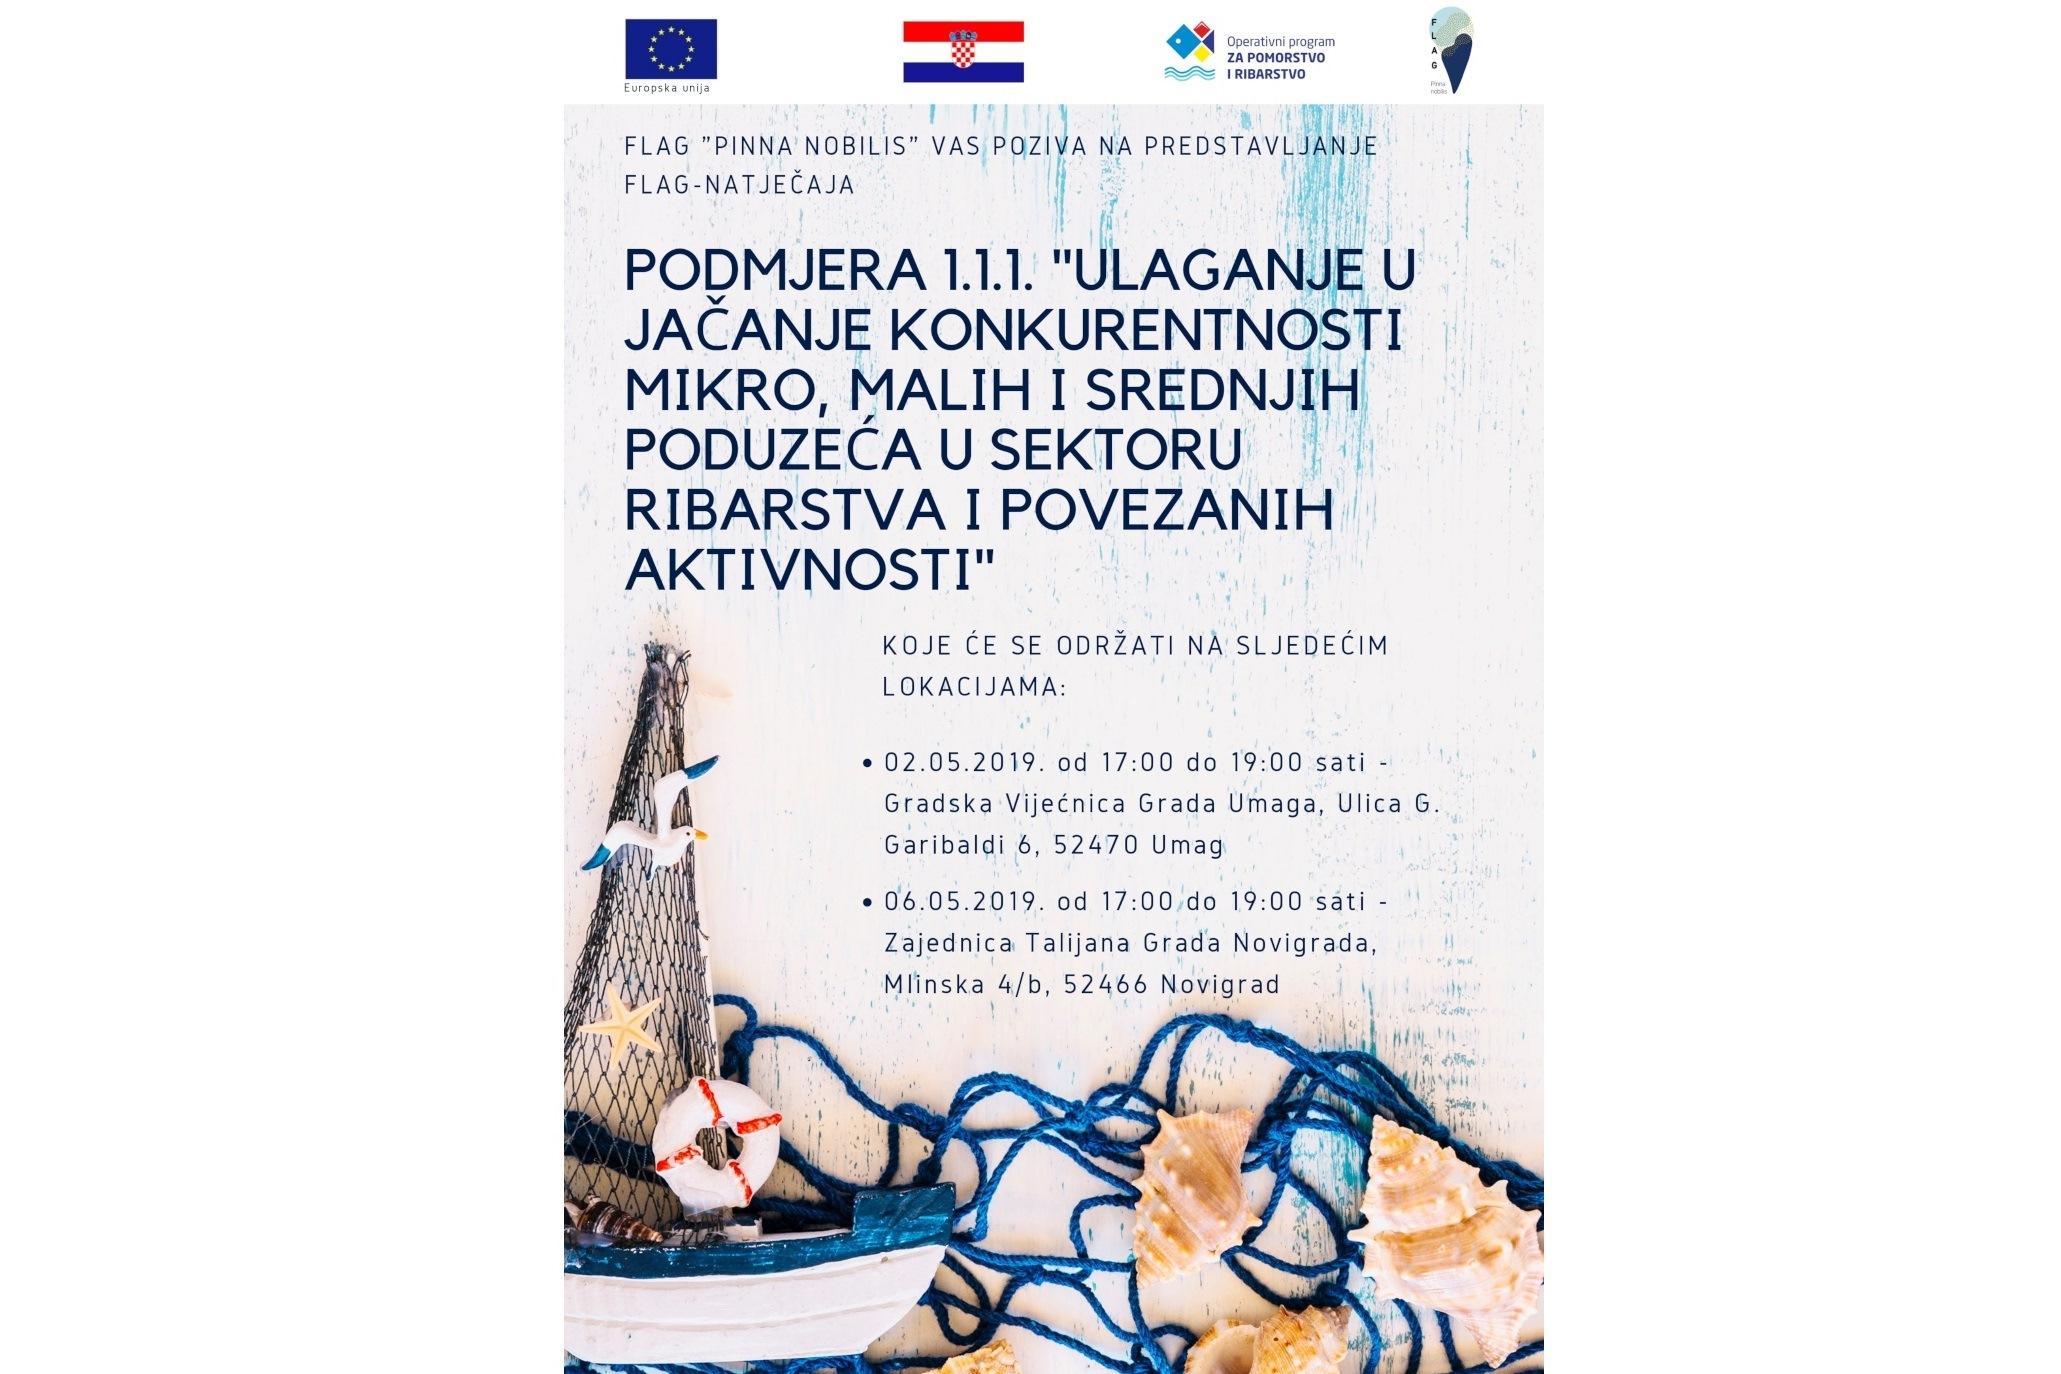 http://www.novigrad.hr/flag_pinna_nobilis_objavio_1._flag_natjechaj_za_podmjeru_1.1.1._iz_svoje_lo